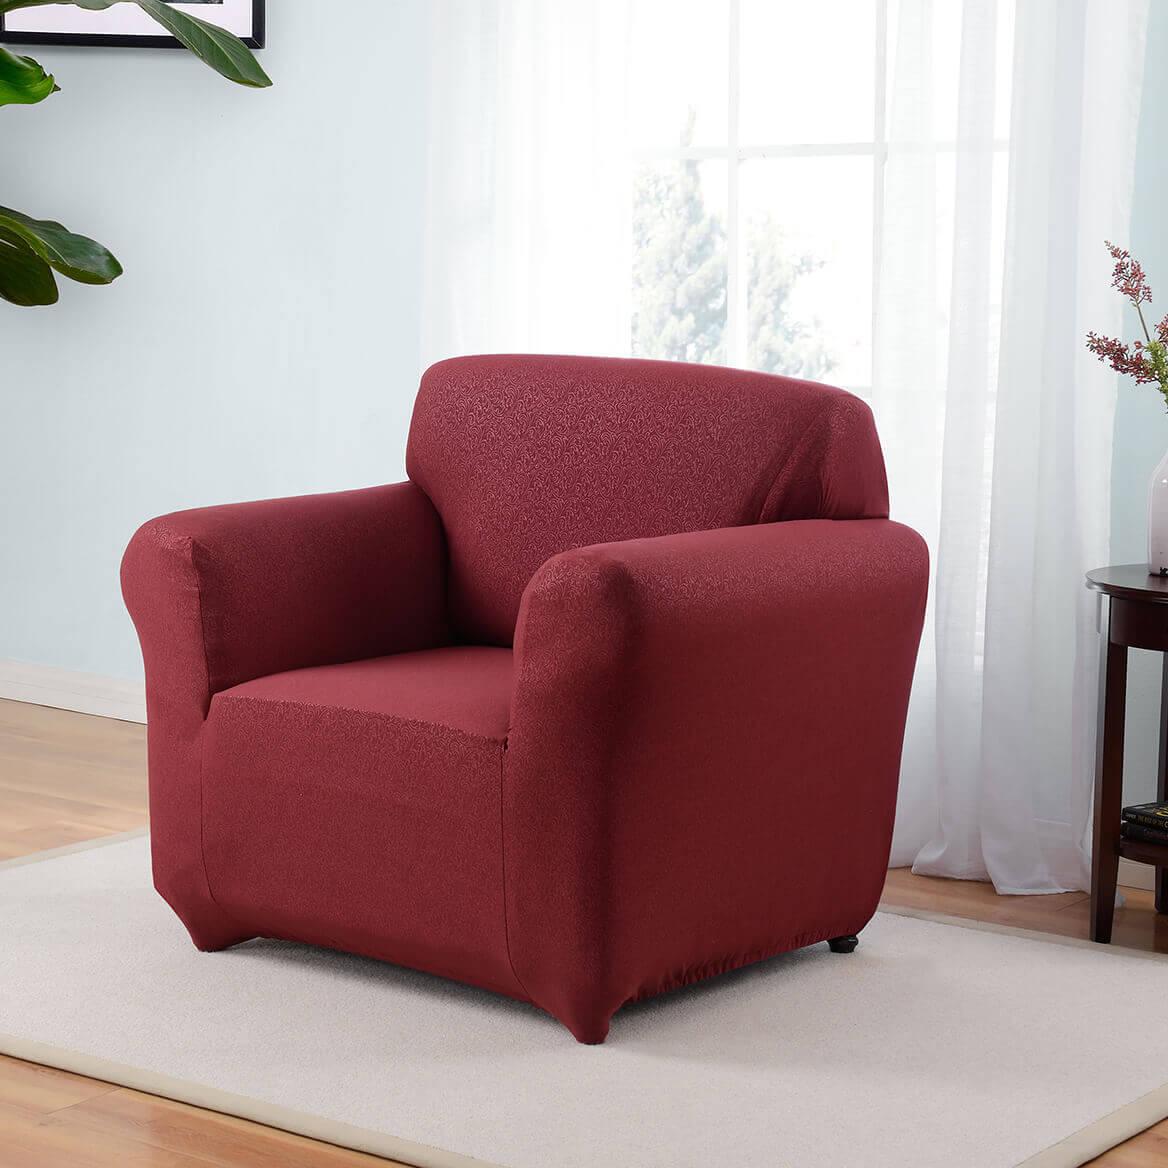 Kathy Ireland Ingenue Chair Slipcover-362618